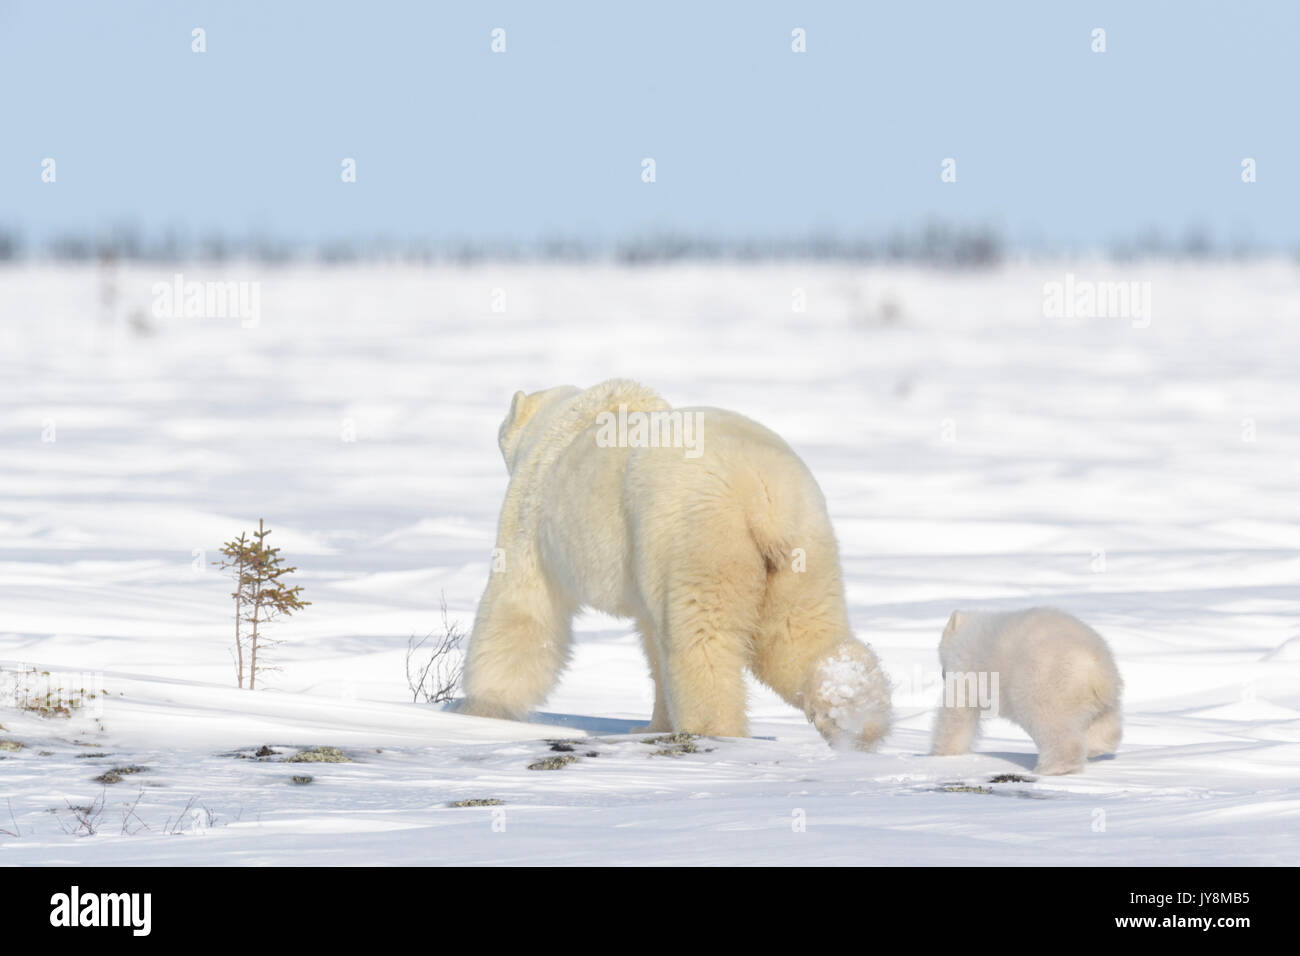 Polar bear mother (Ursus maritimus) with new born cub walking on tundra, Wapusk National Park, Manitoba, Canada - Stock Image